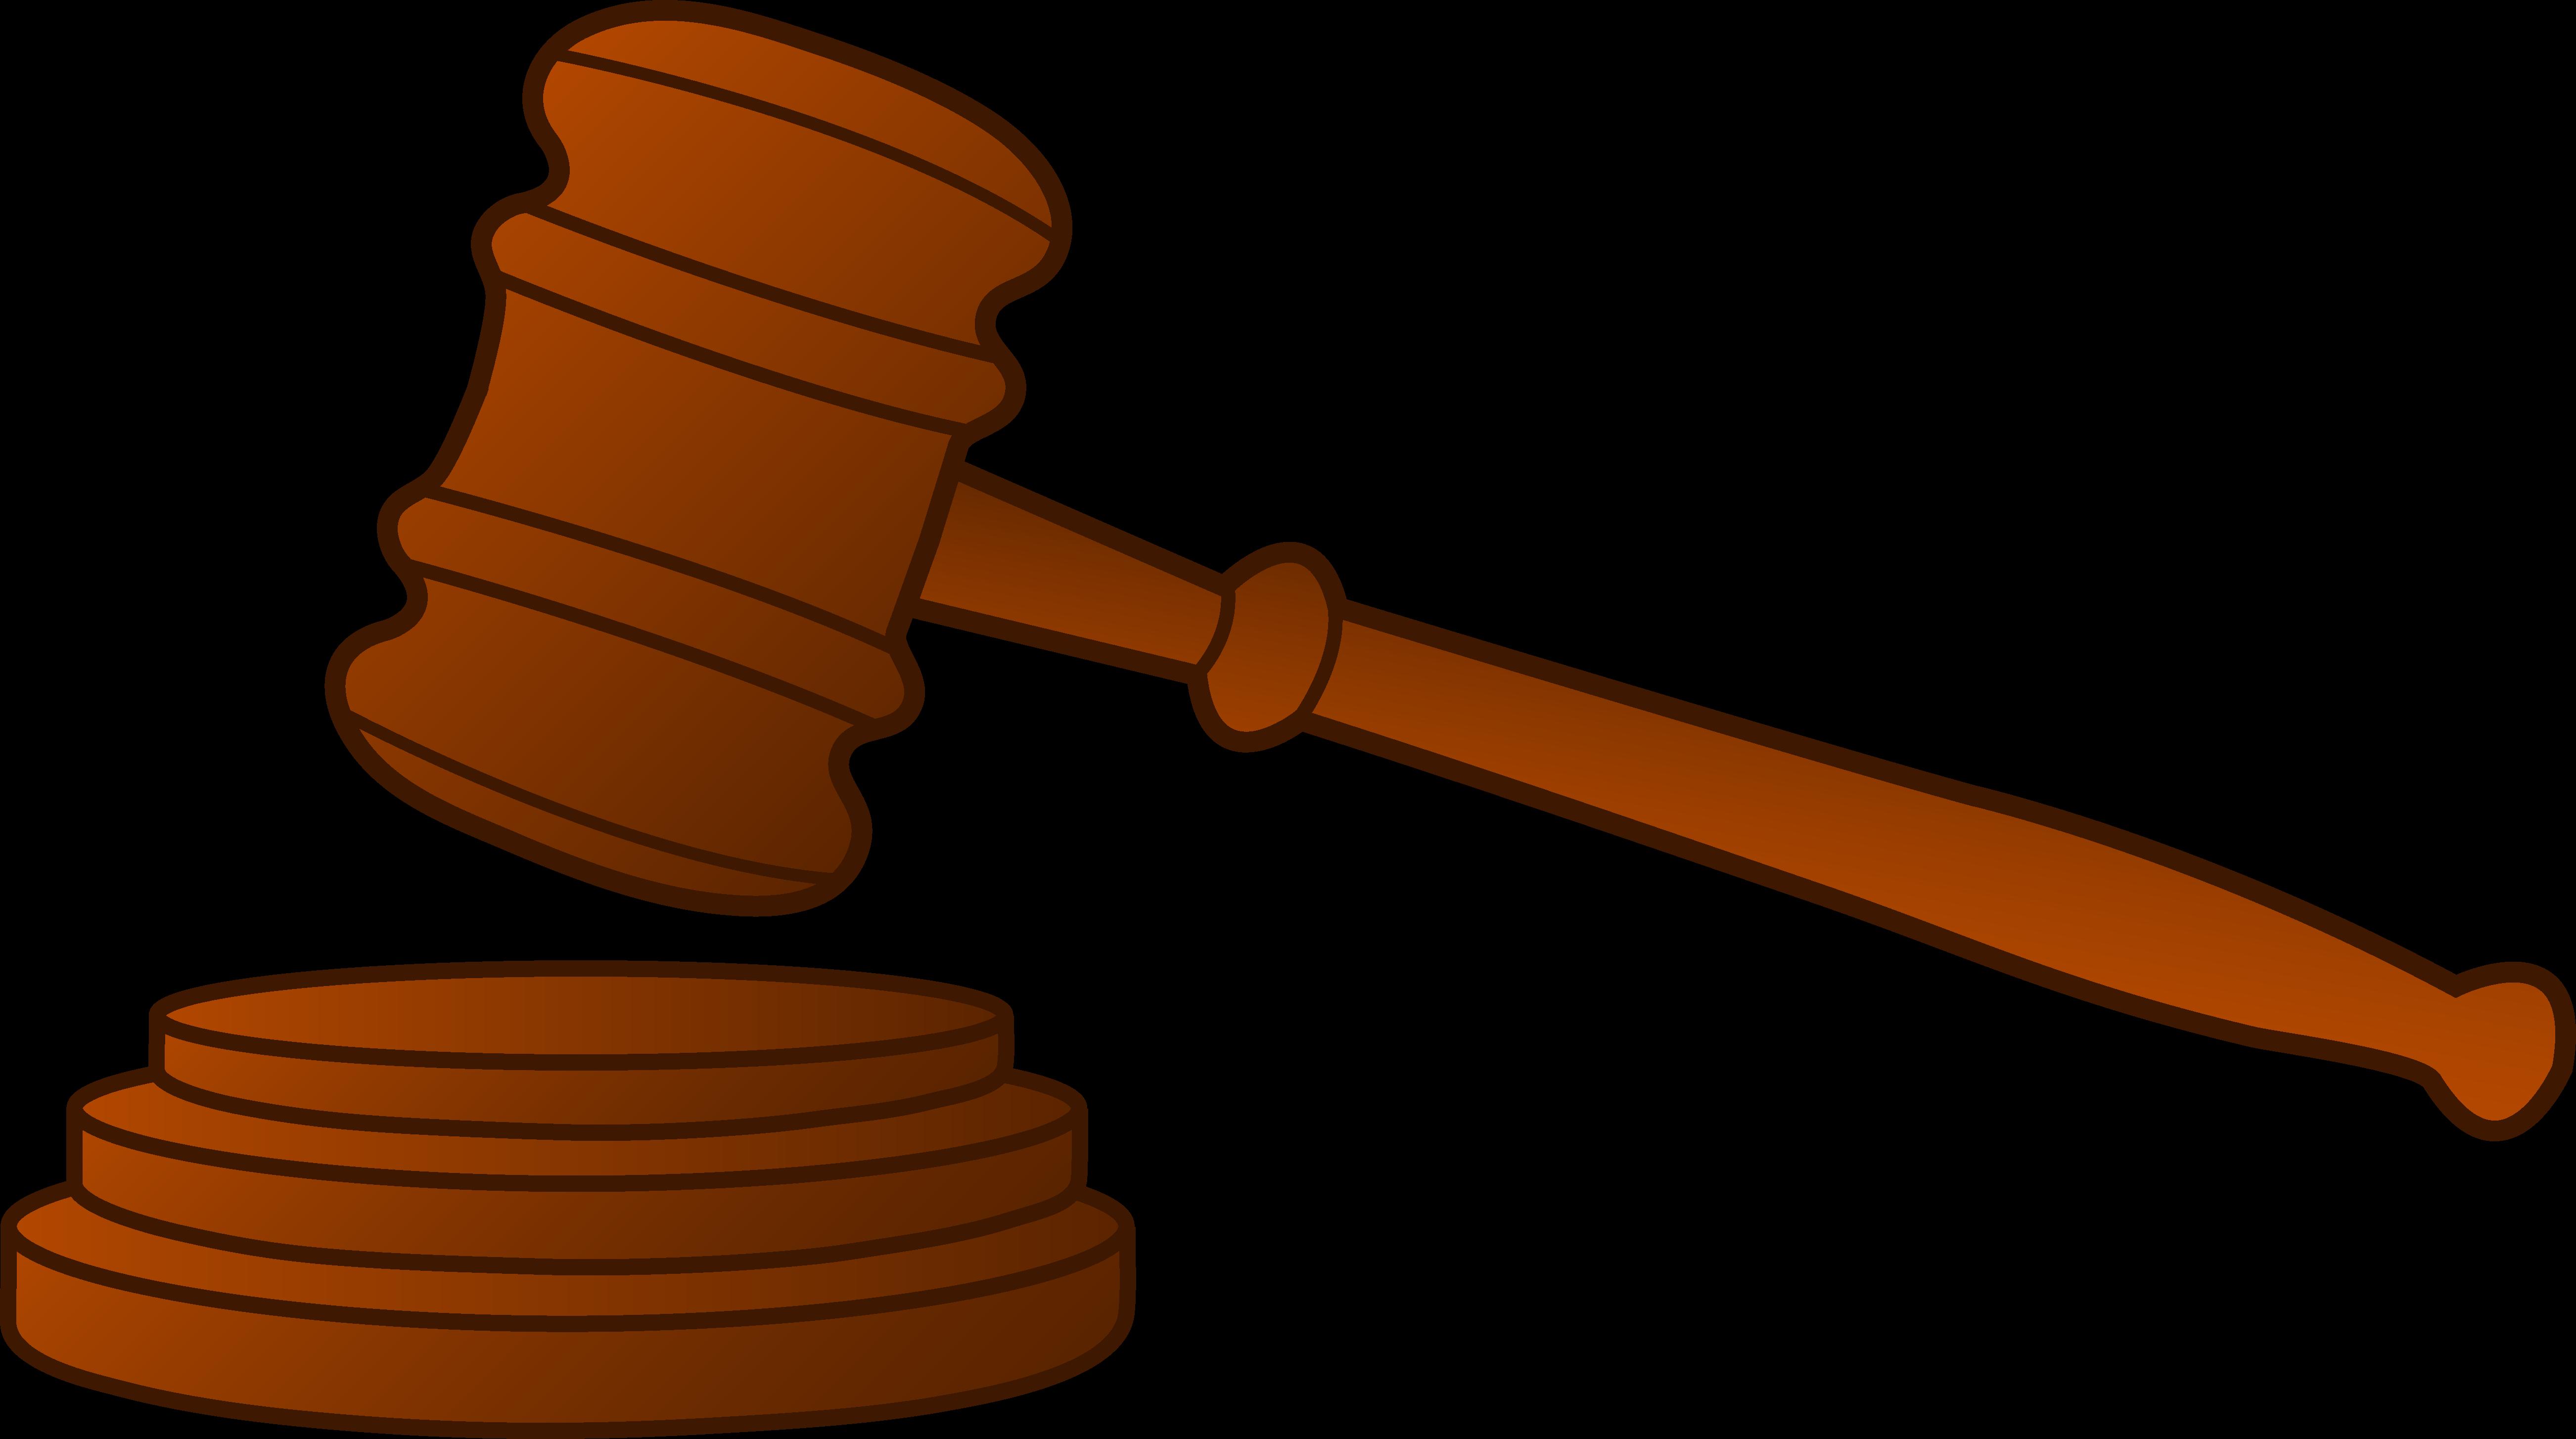 Judge Hammer Cliparts.